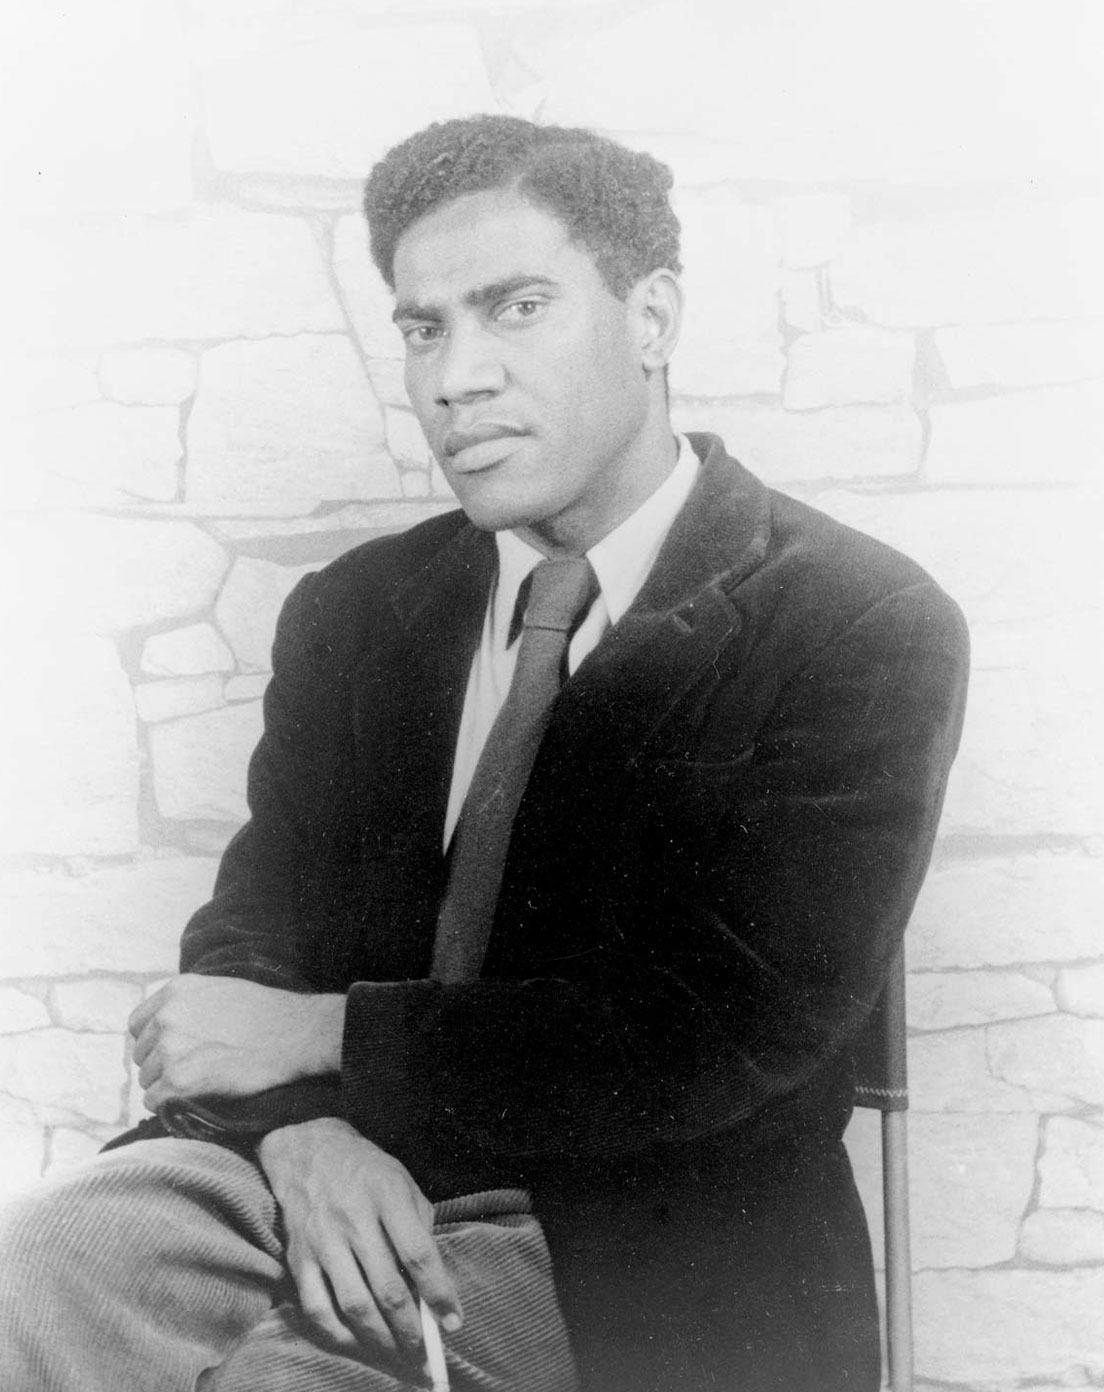 Portrait of George Lamming